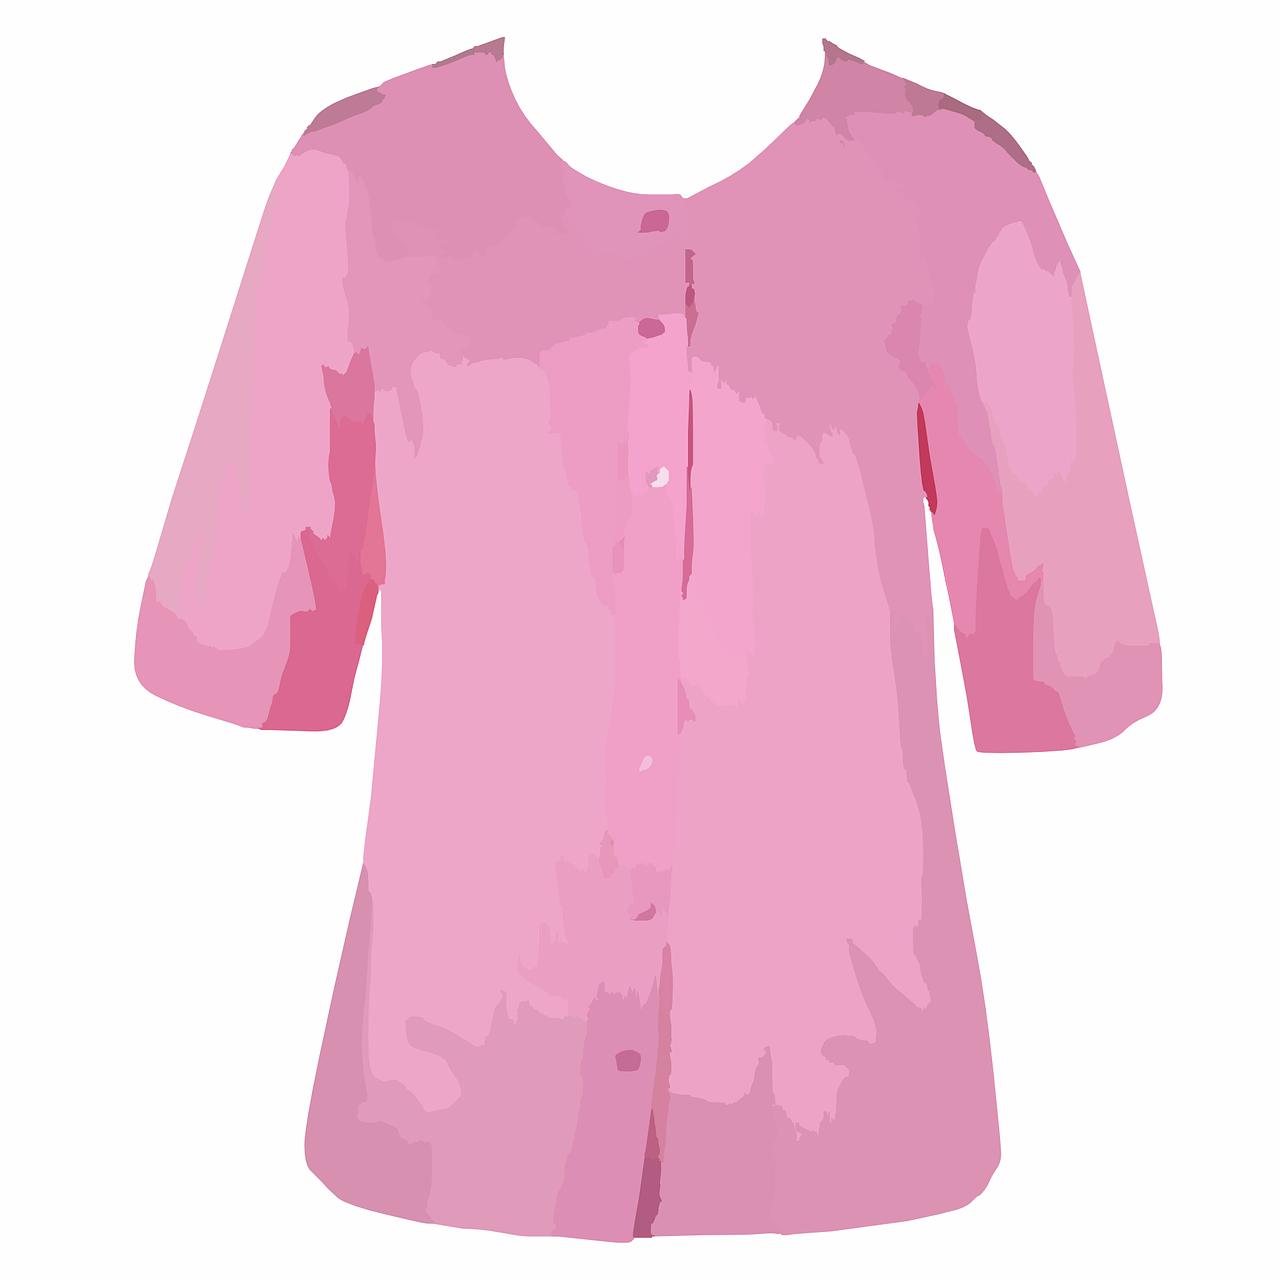 Blouse,top,pink,shirt,summer - free image from needpix.com